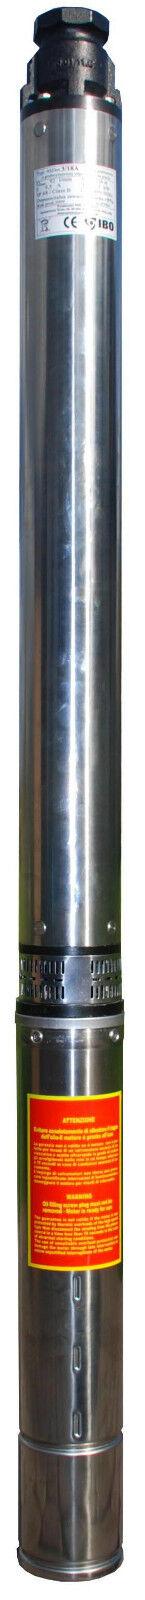 Bomba Para Pozo De Agua Sumergible ascendente 4 SD8-15 cabeza de 100m, 15000Lph, 400V resistente a la arena